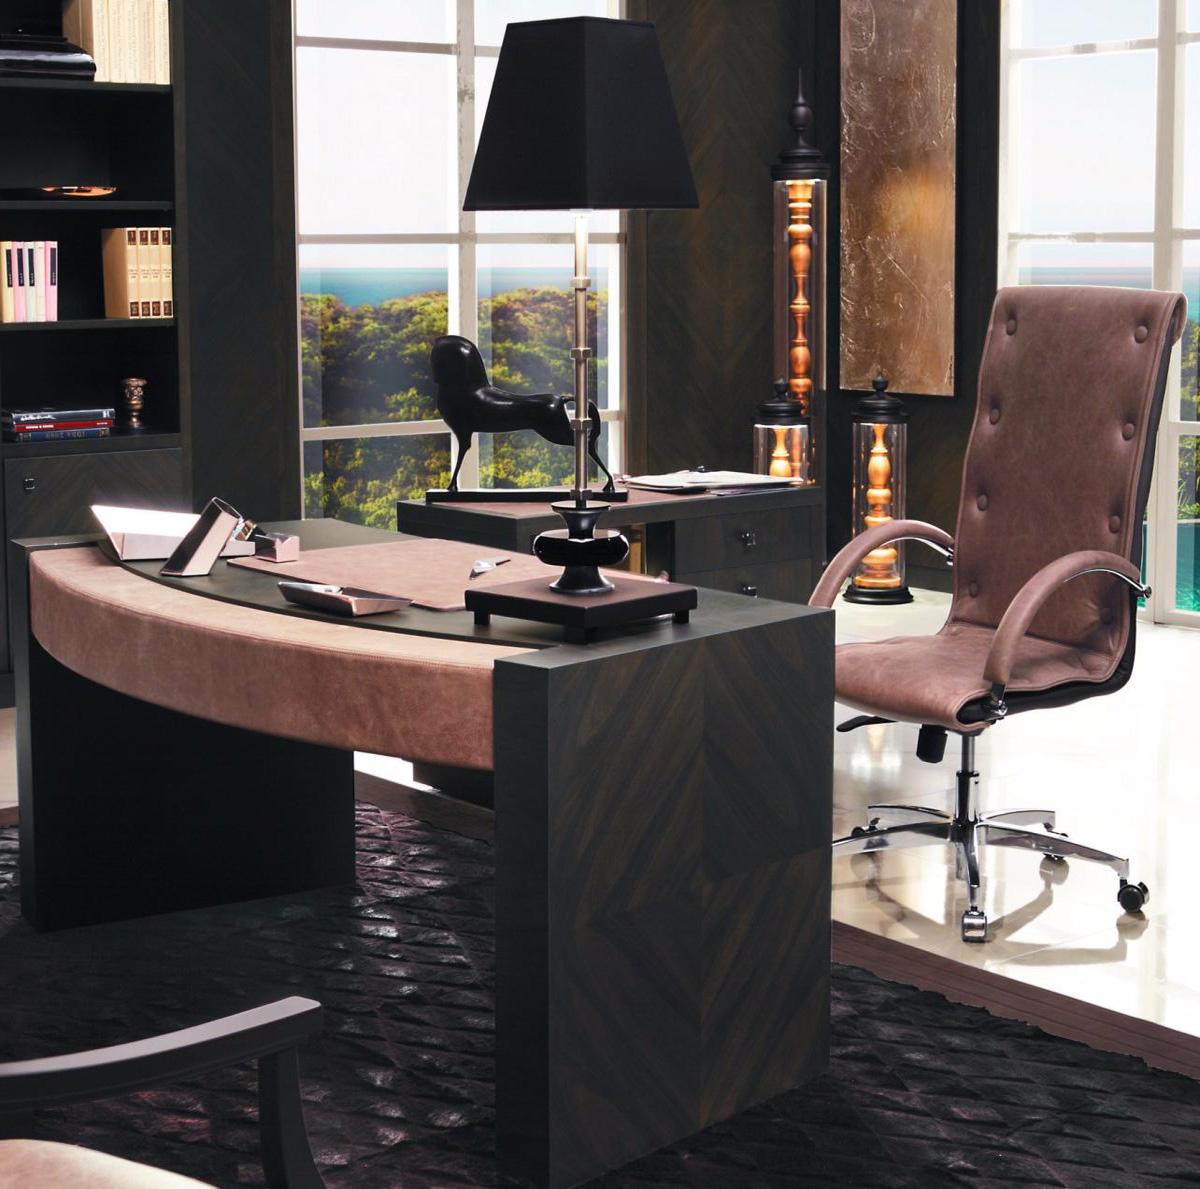 good-office-interior-design-improves-employee-motivation